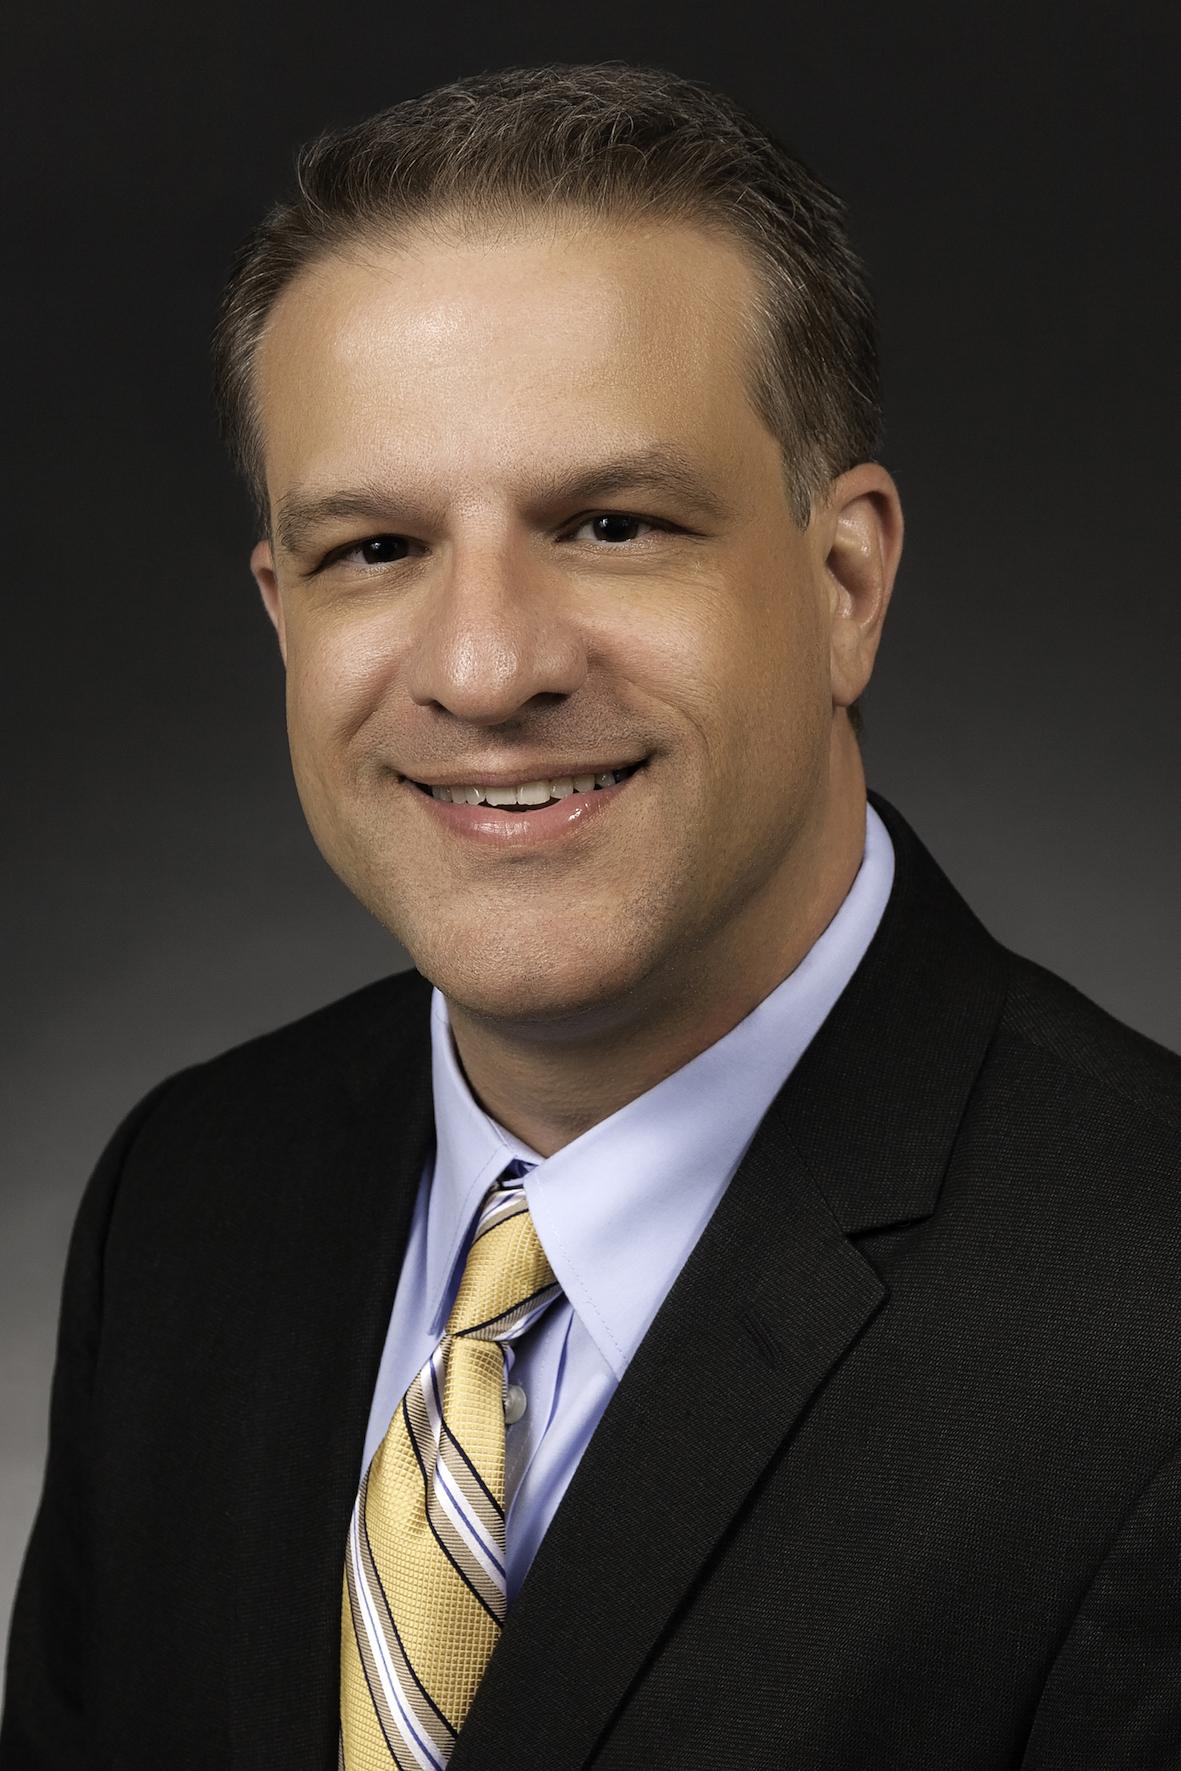 Richard Sturm